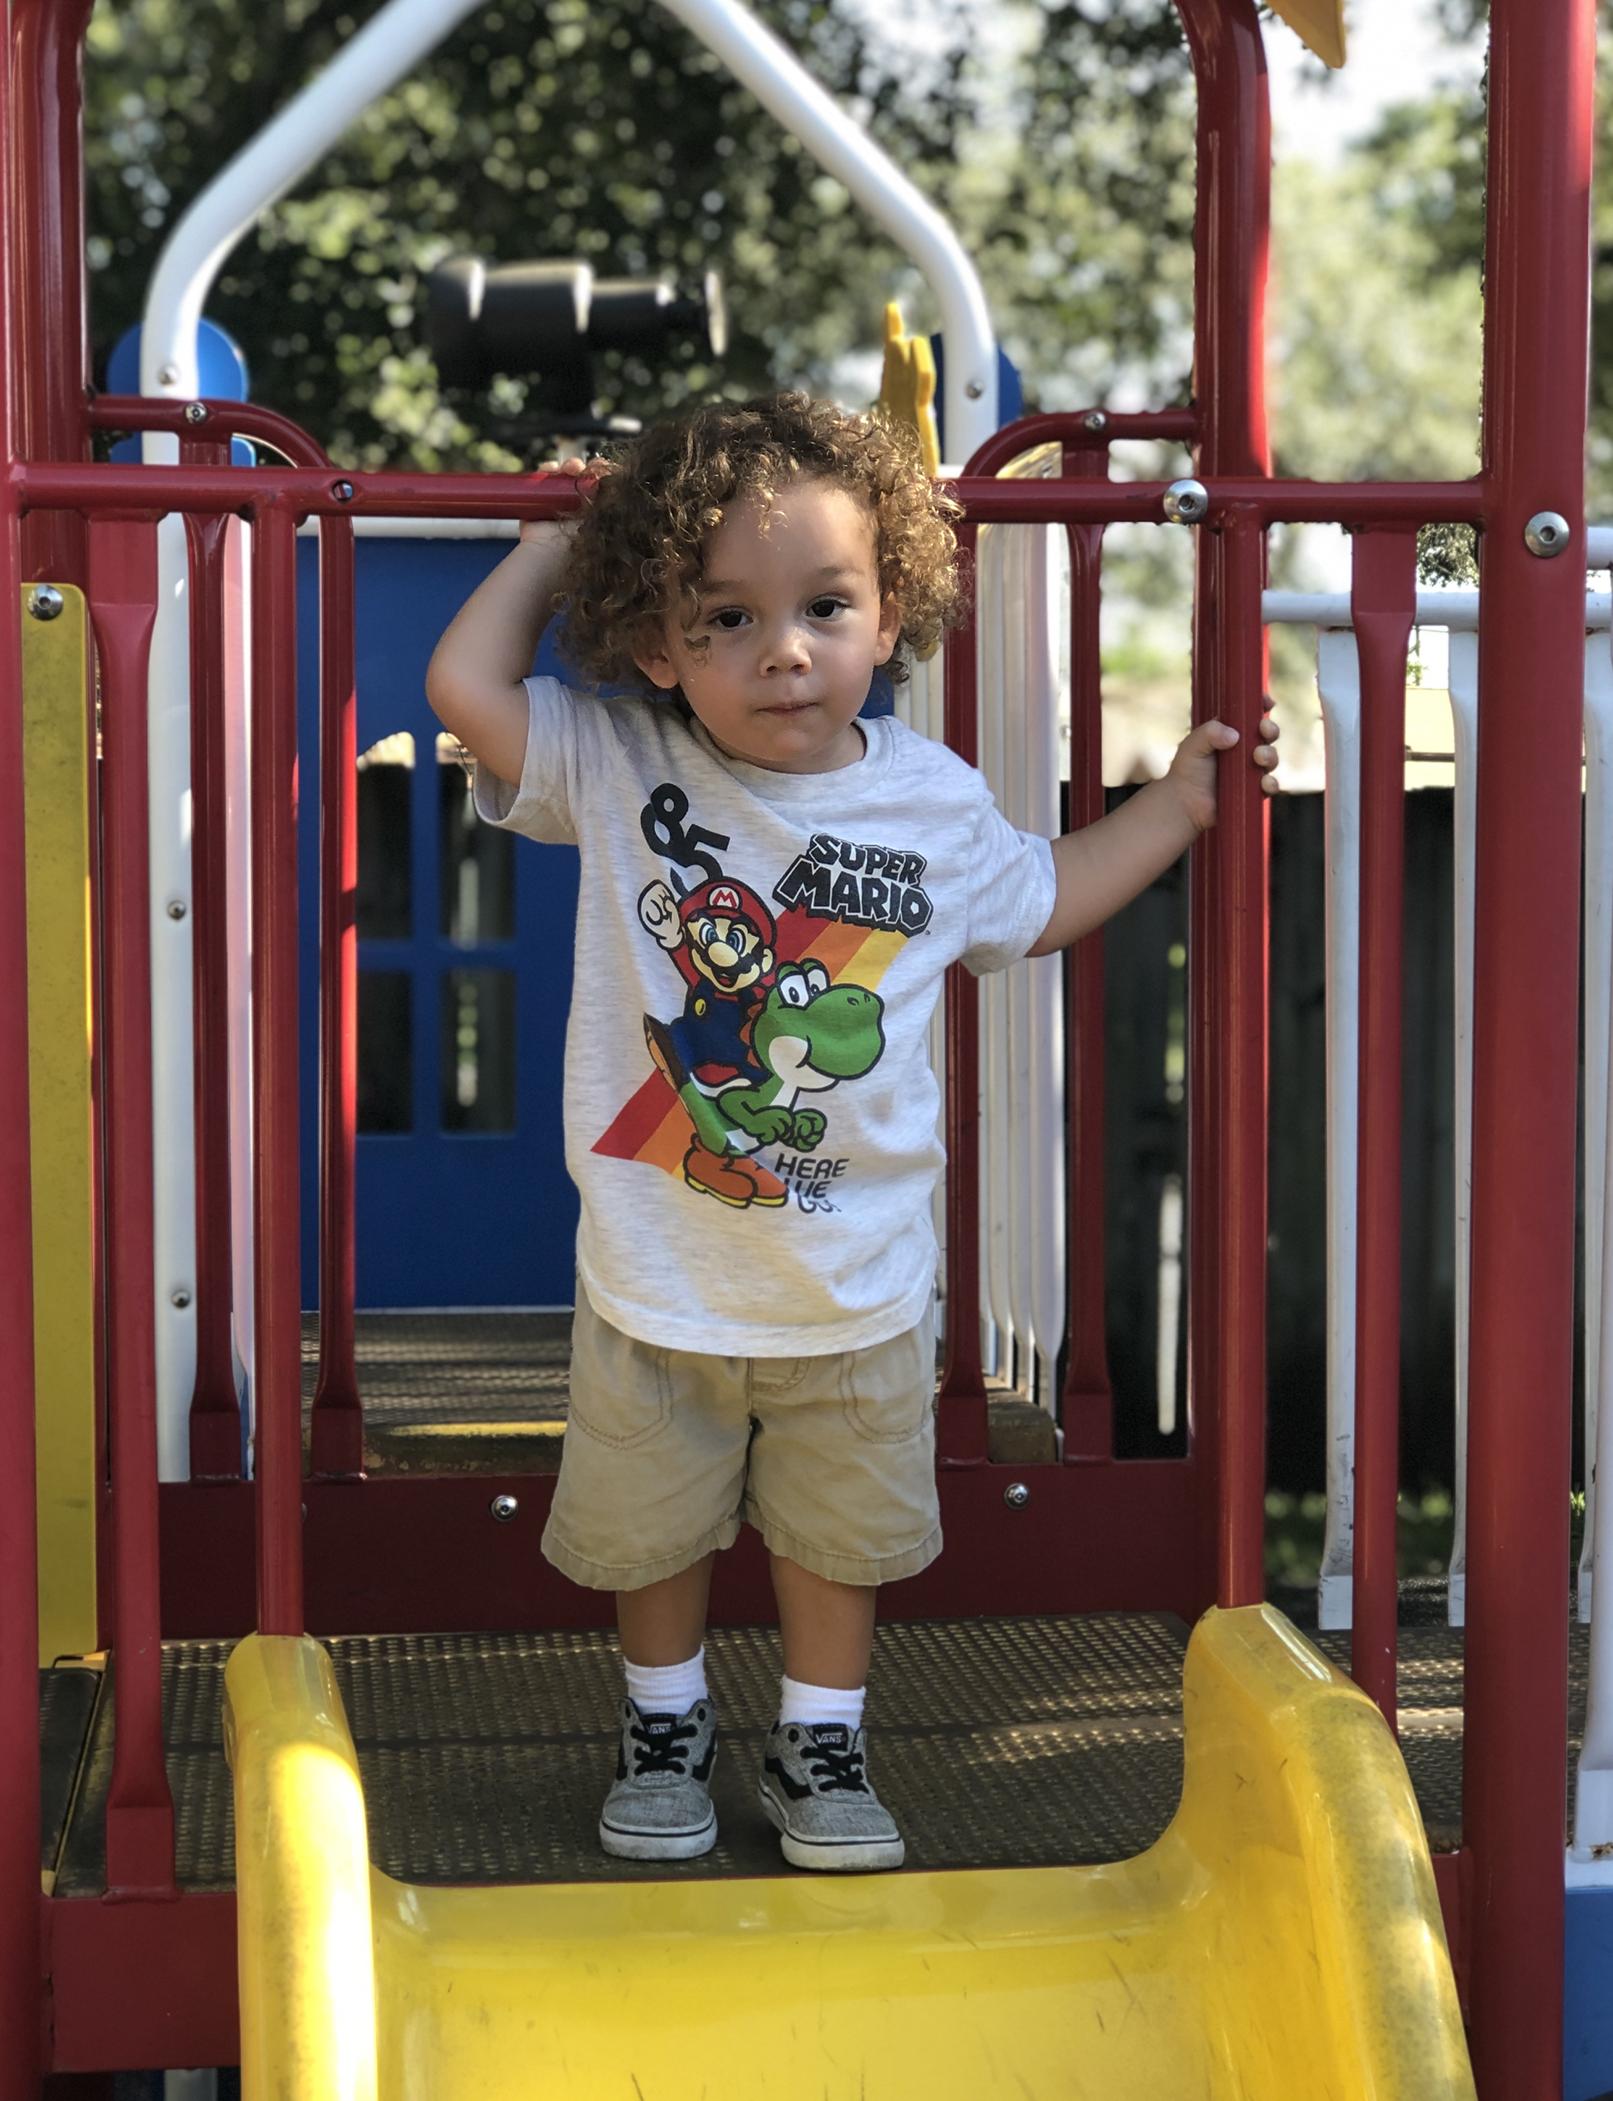 holycross-kid-standing-at-top-of-playground-slide